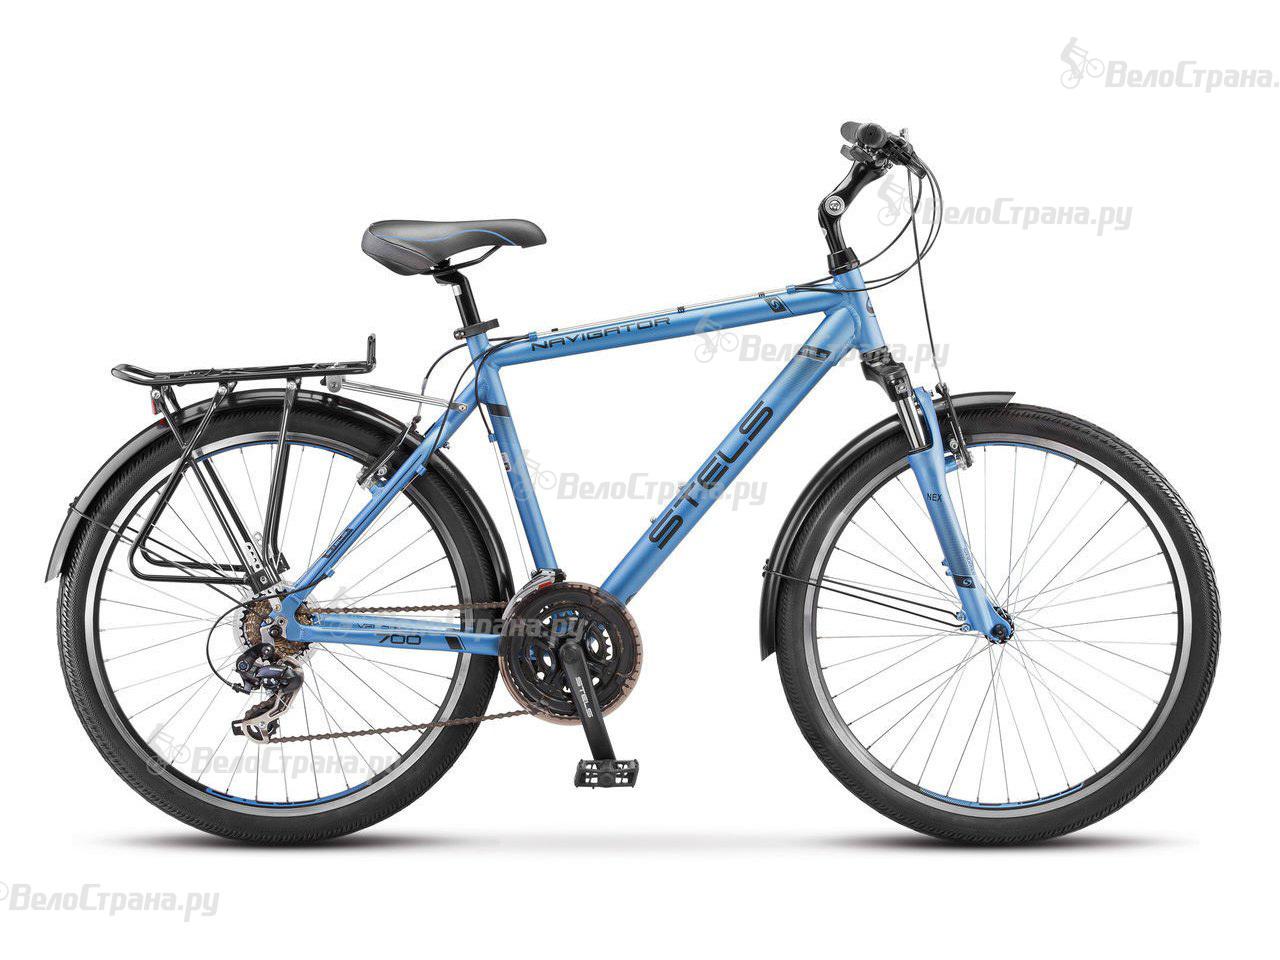 Велосипед Stels Navigator 700 (2016) велосипед stels navigator 700 2017